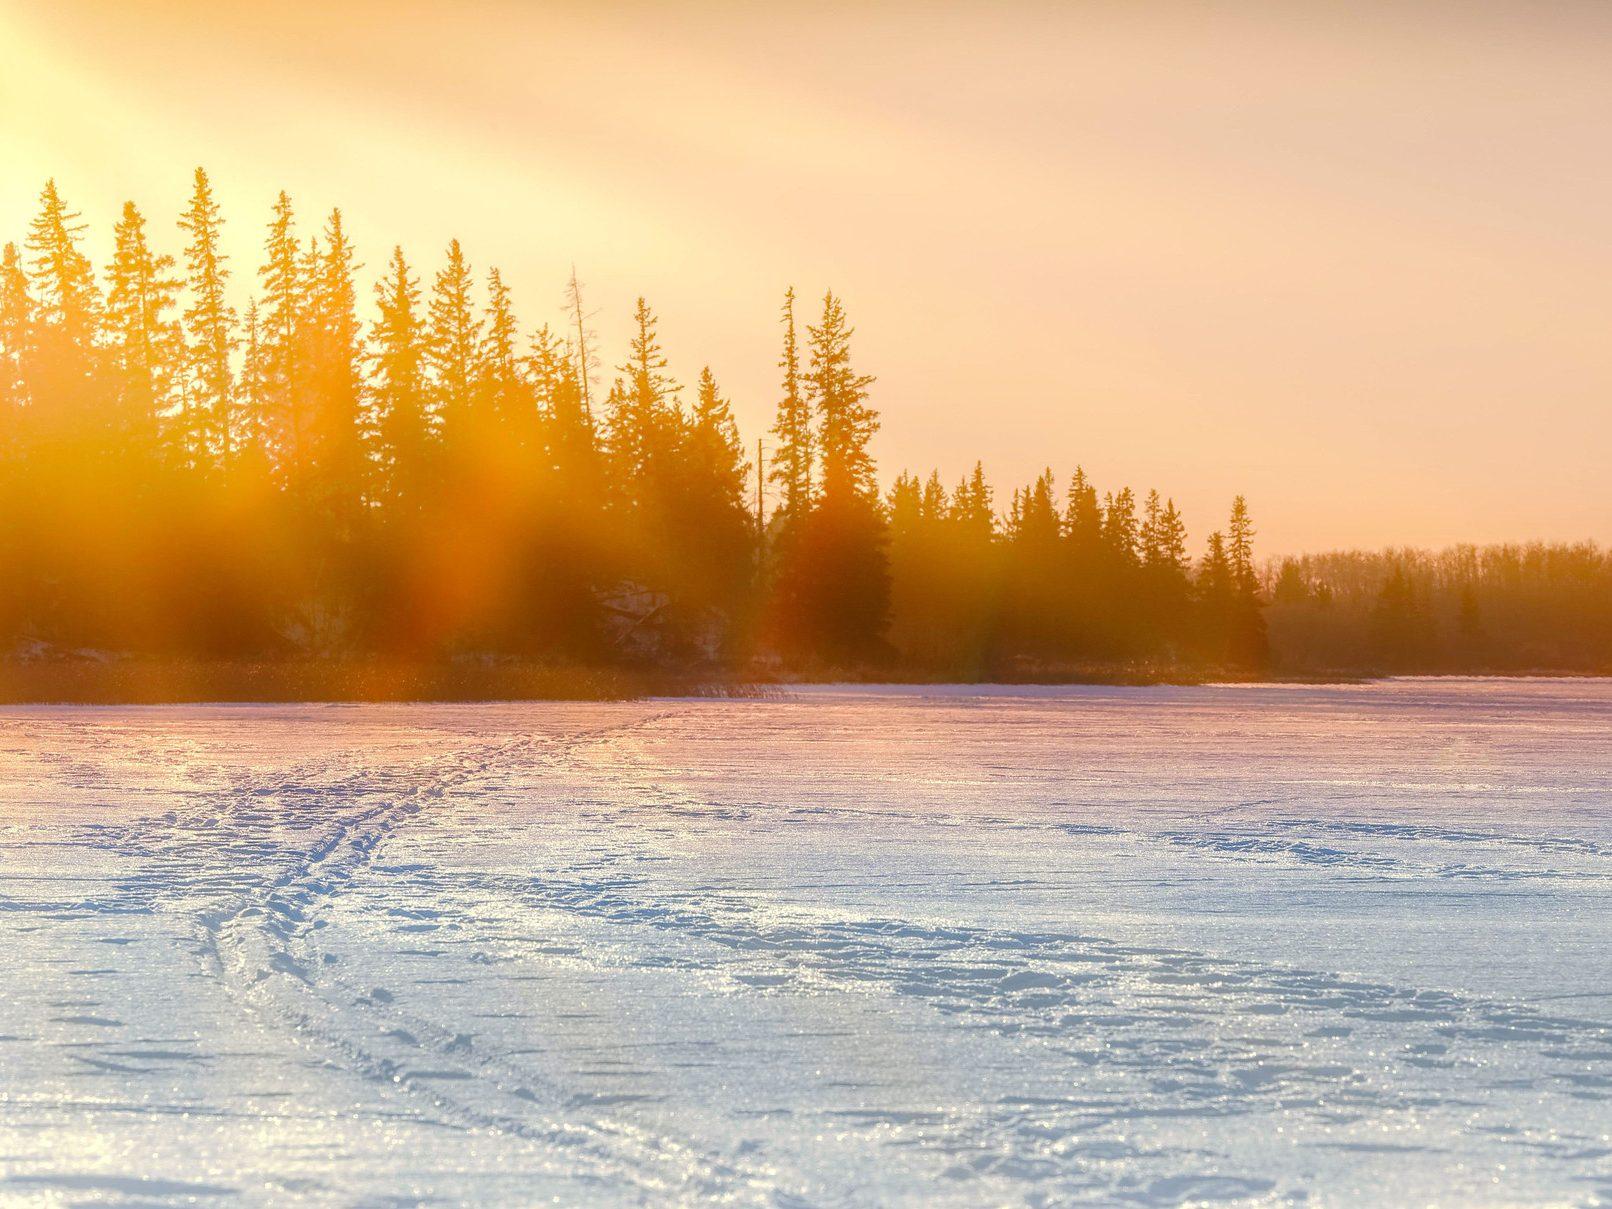 Sunset at Elk Island